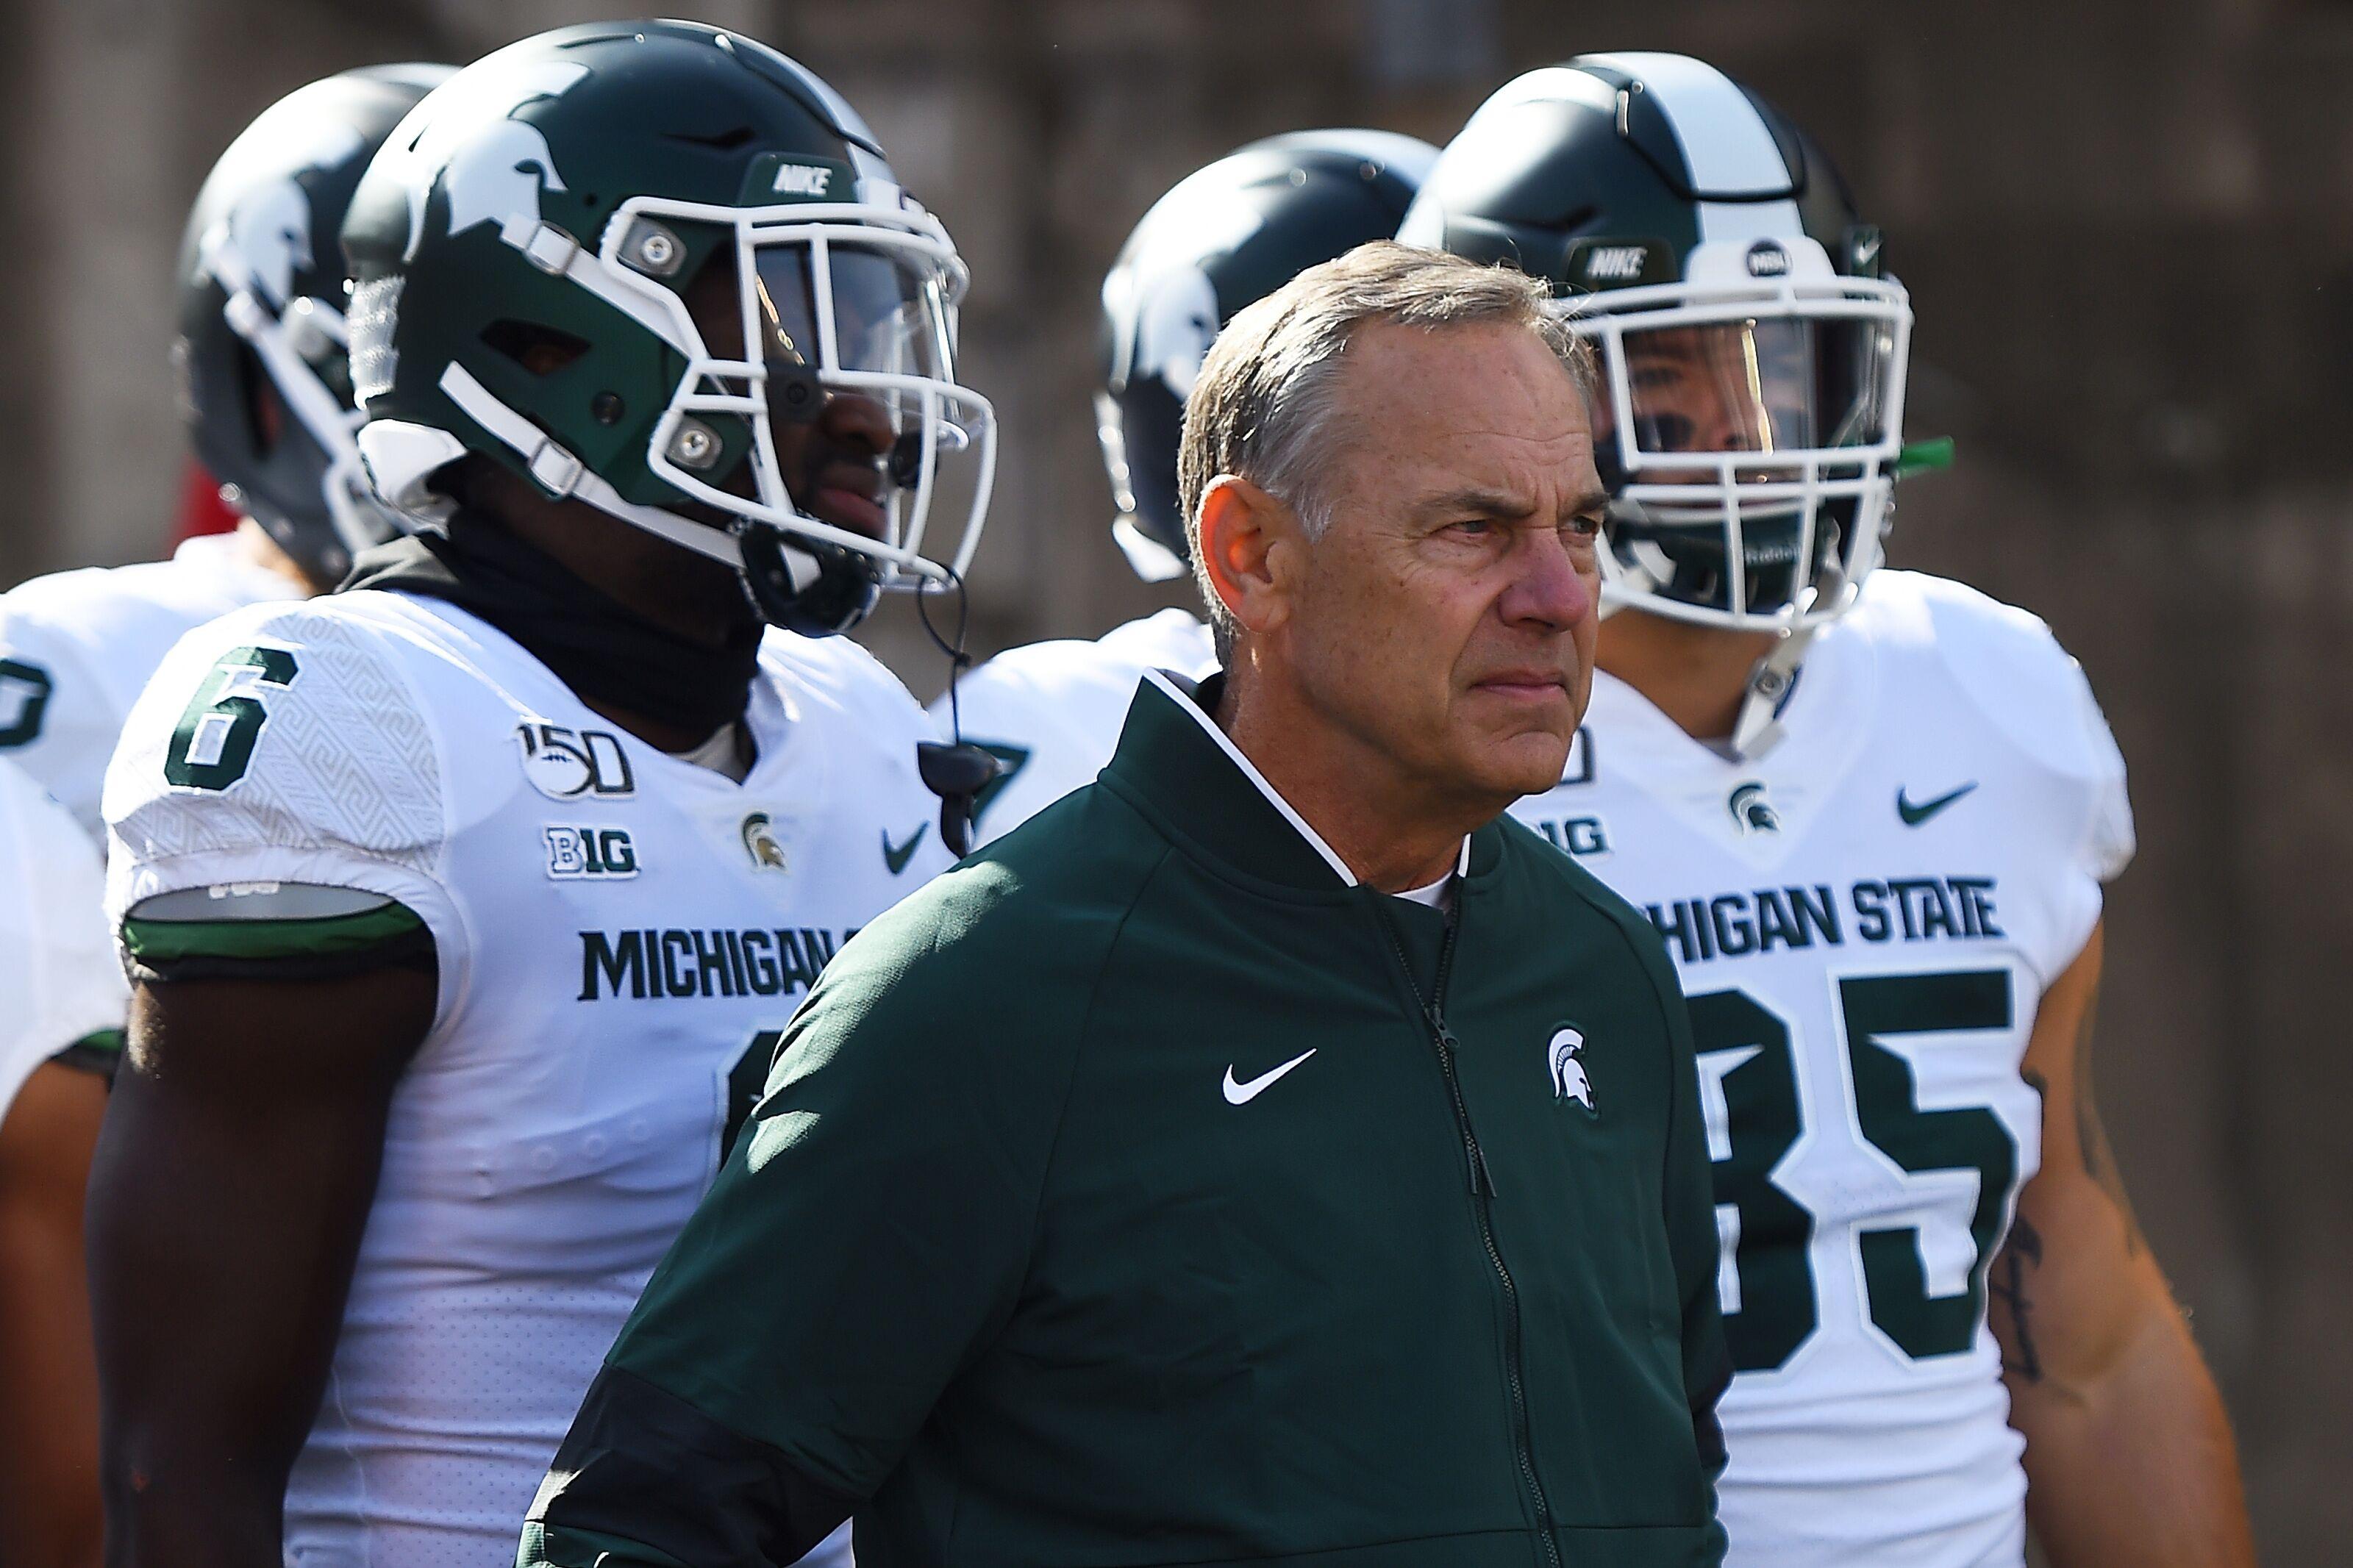 Michigan State Football: 3 ways Spartans can turn 2019 season around